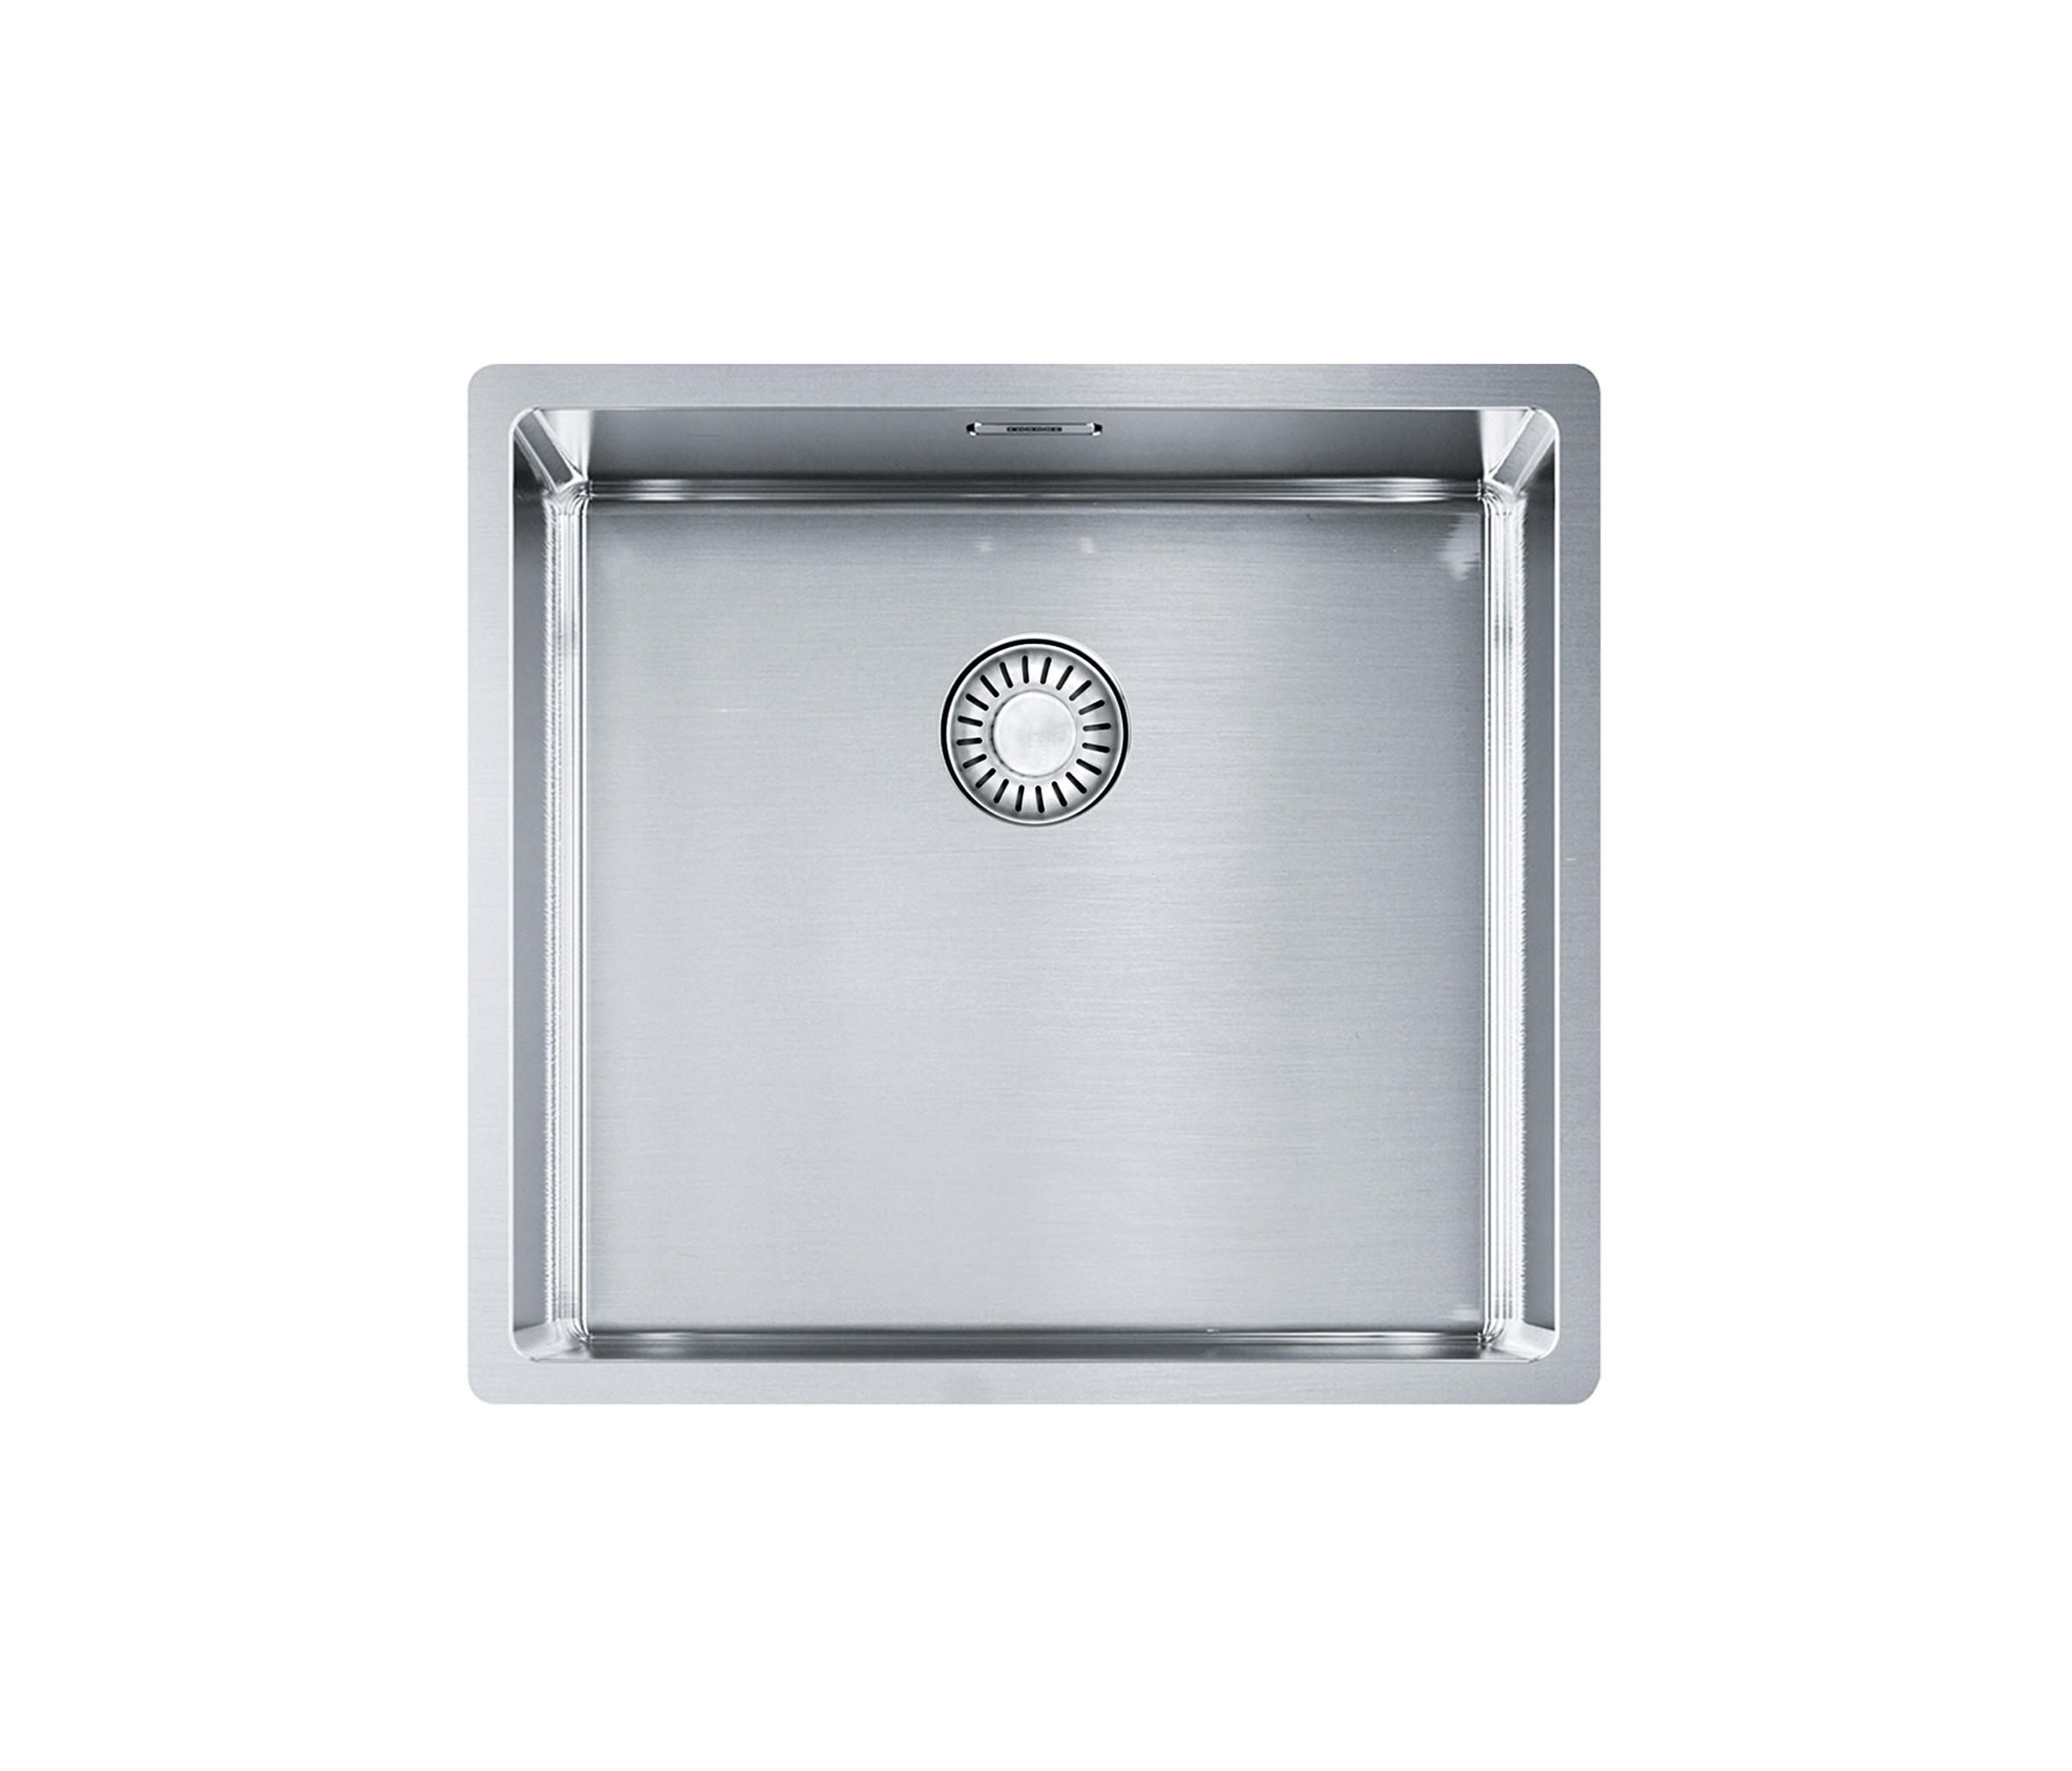 franke box sink bxx 110 45 stainless steel kitchen sinks. Black Bedroom Furniture Sets. Home Design Ideas